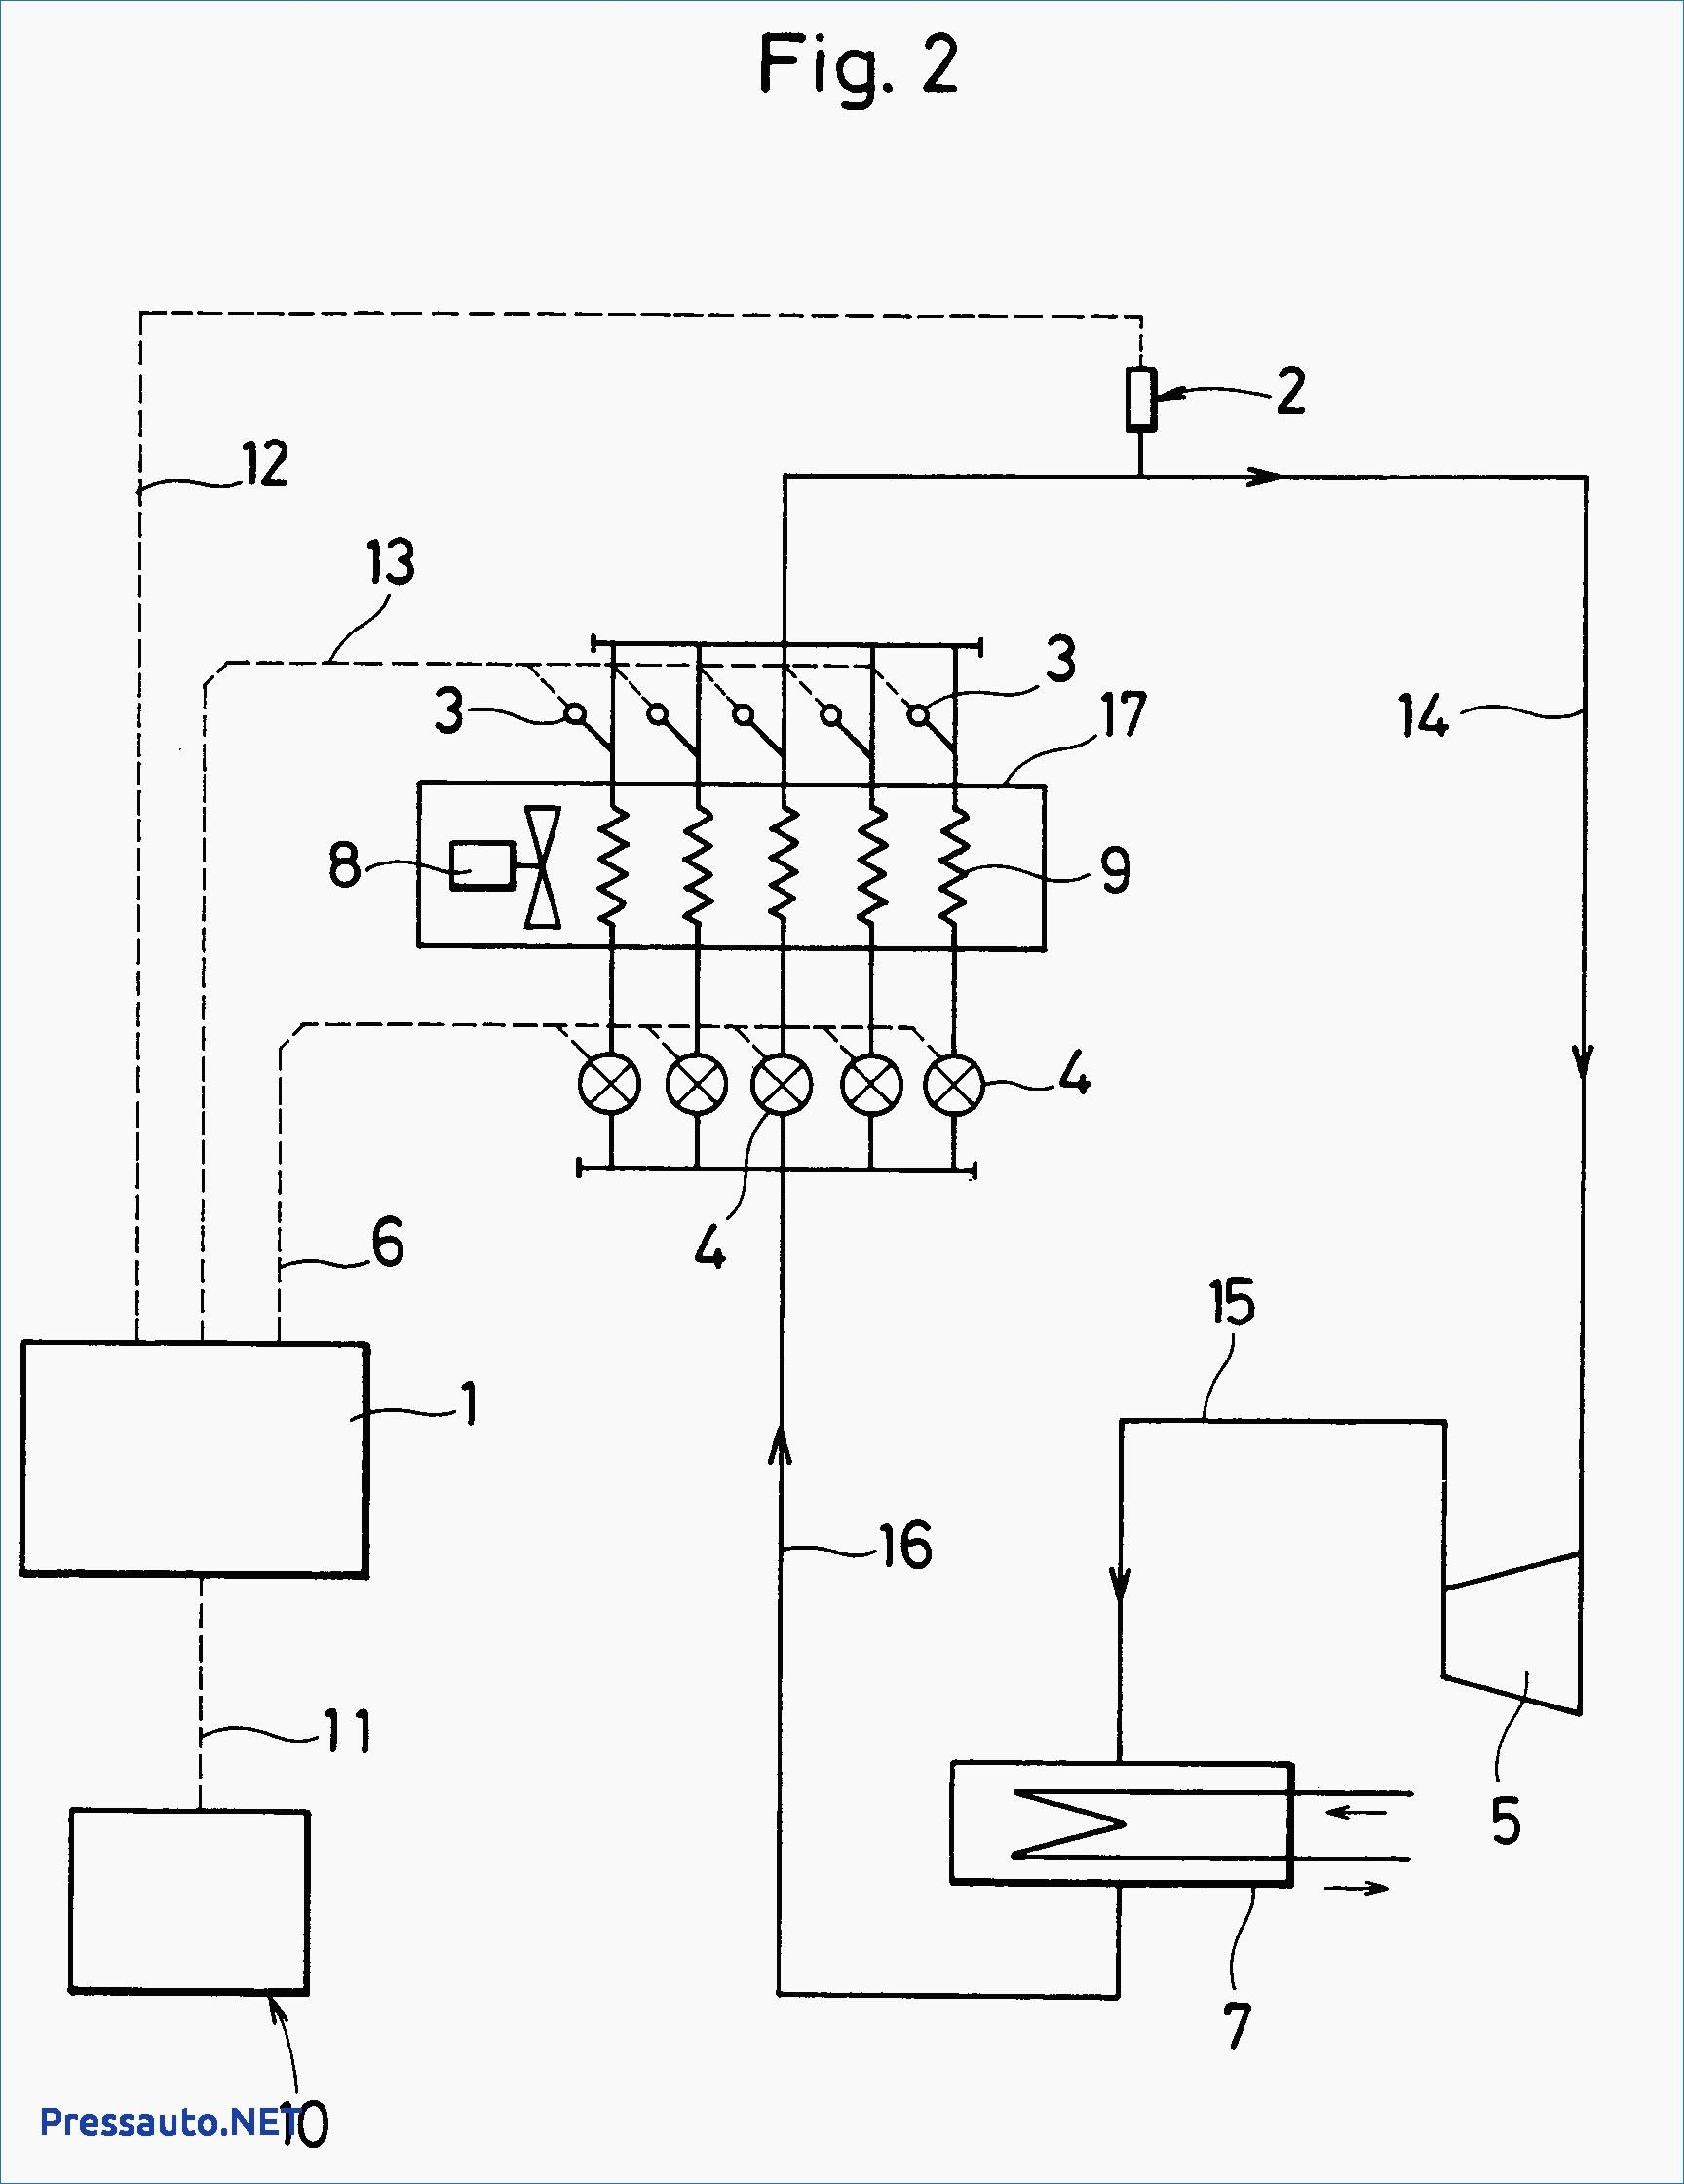 Heatcraft Walk In Freezer Wiring Diagram   Free Wiring Diagram on